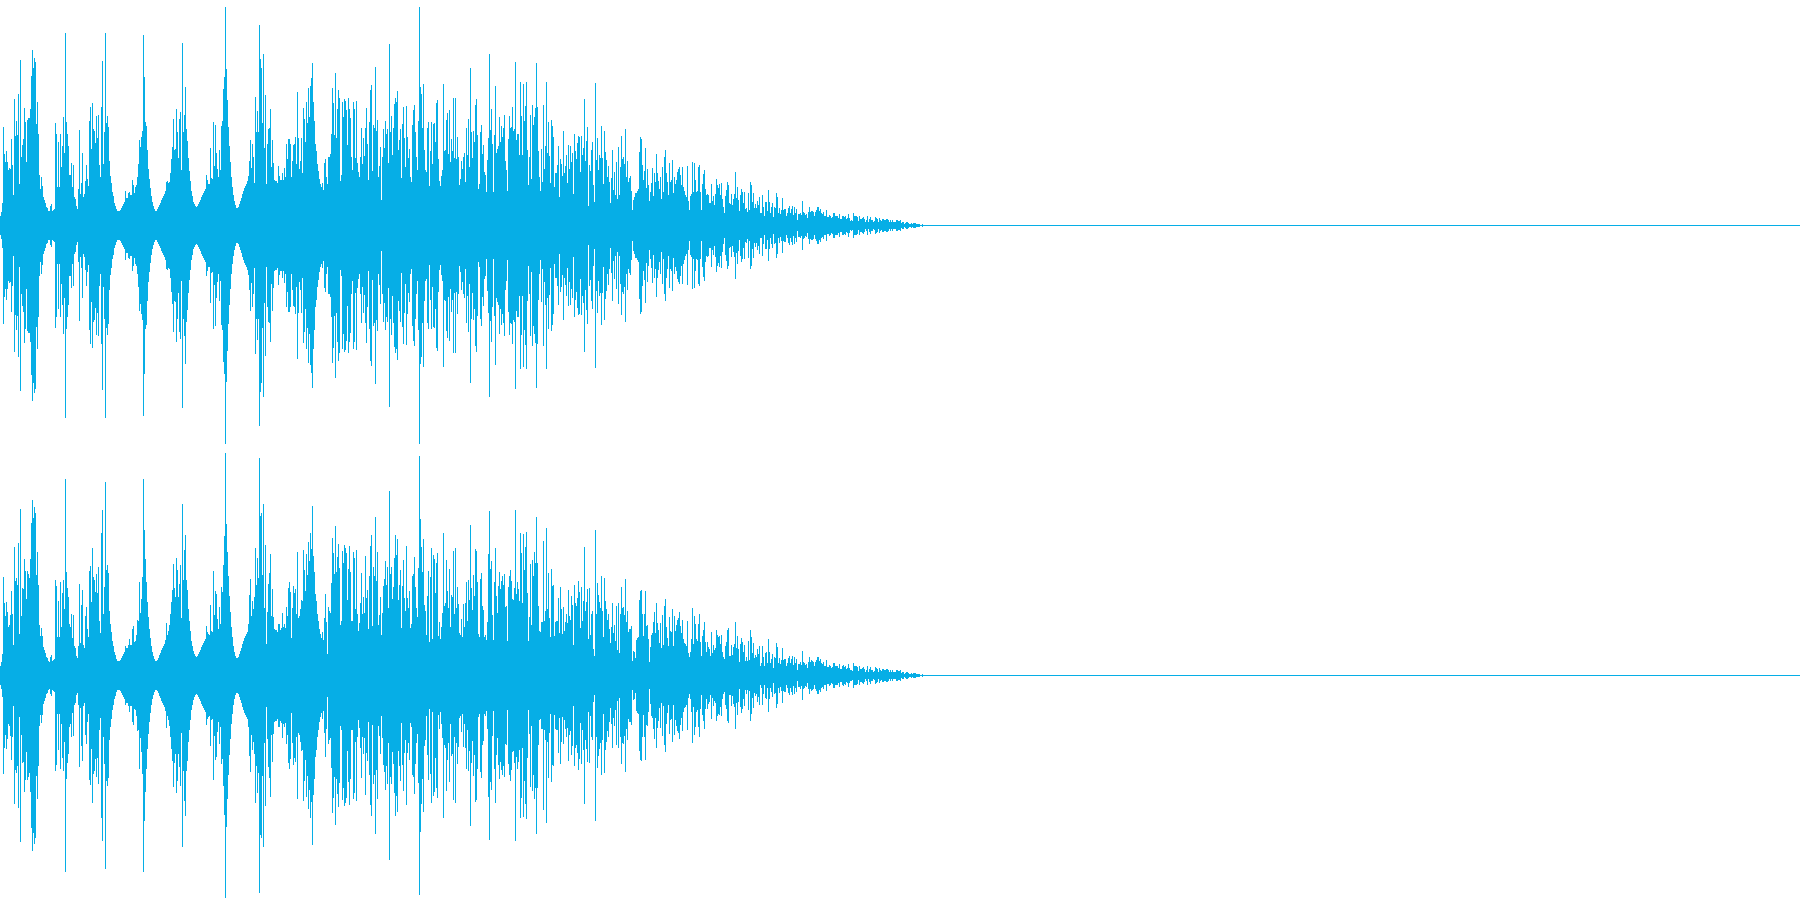 DTM Snare 2 オリジナル音源の再生済みの波形